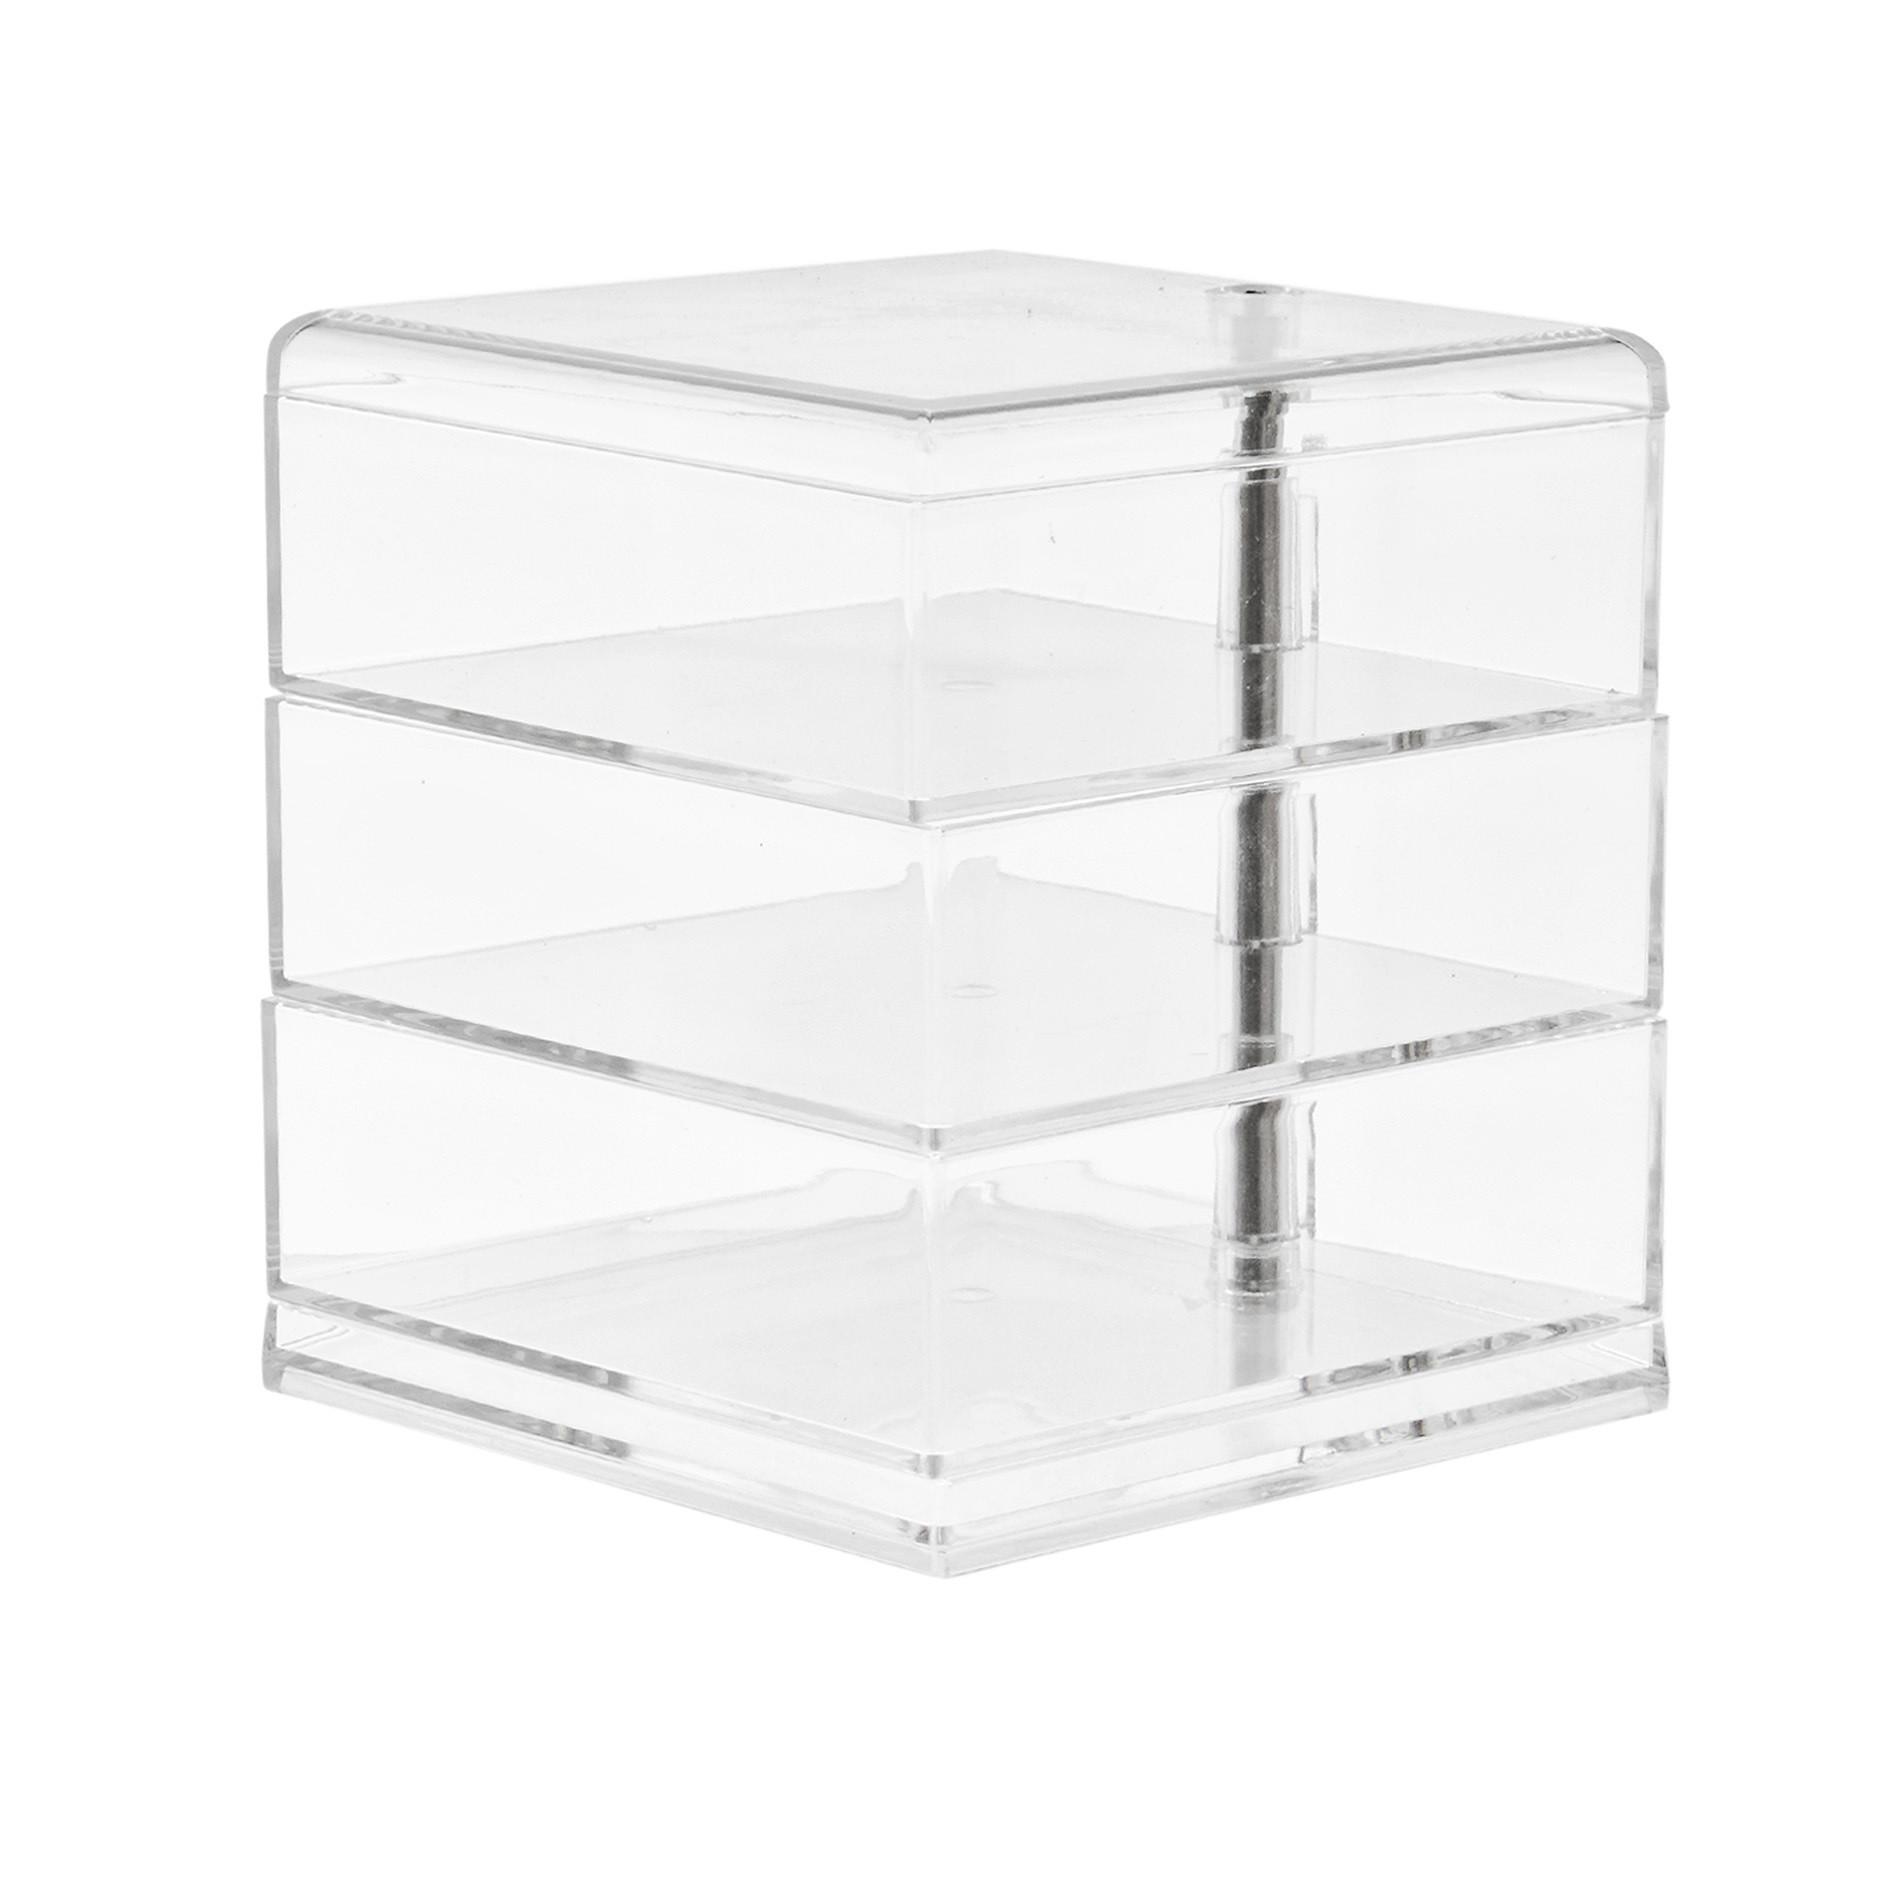 Storage 3 ripiani in plastica, Trasparente, large image number 0